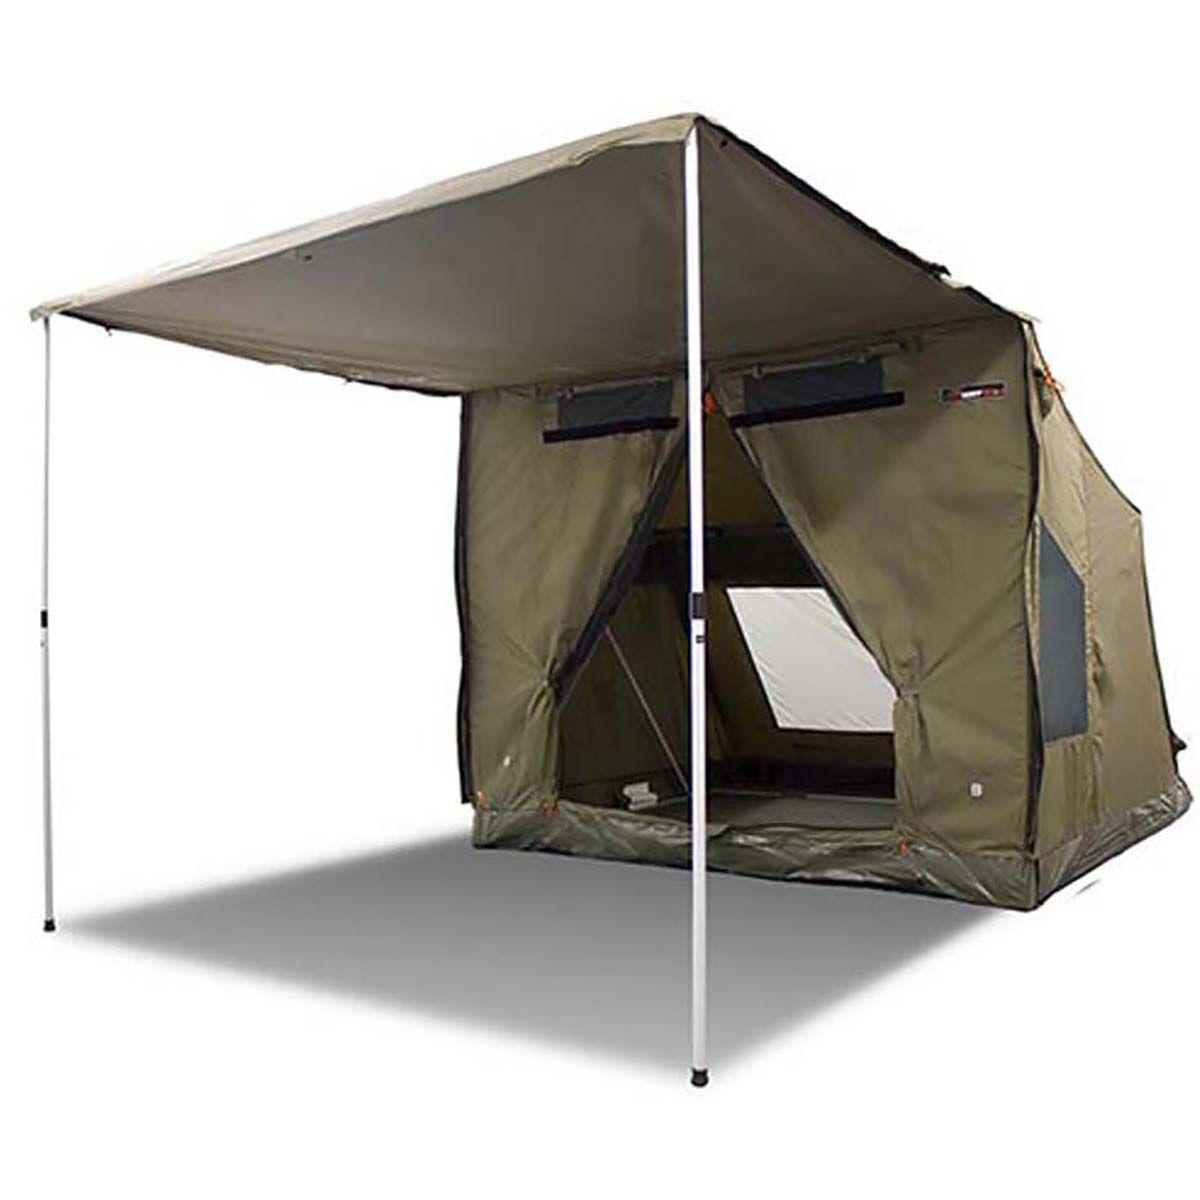 Oztent RV4 Touring Tent 4 Person  bcf_hi-res  sc 1 st  BCF Australia & Oztent RV4 Touring Tent 4 Person   BCF